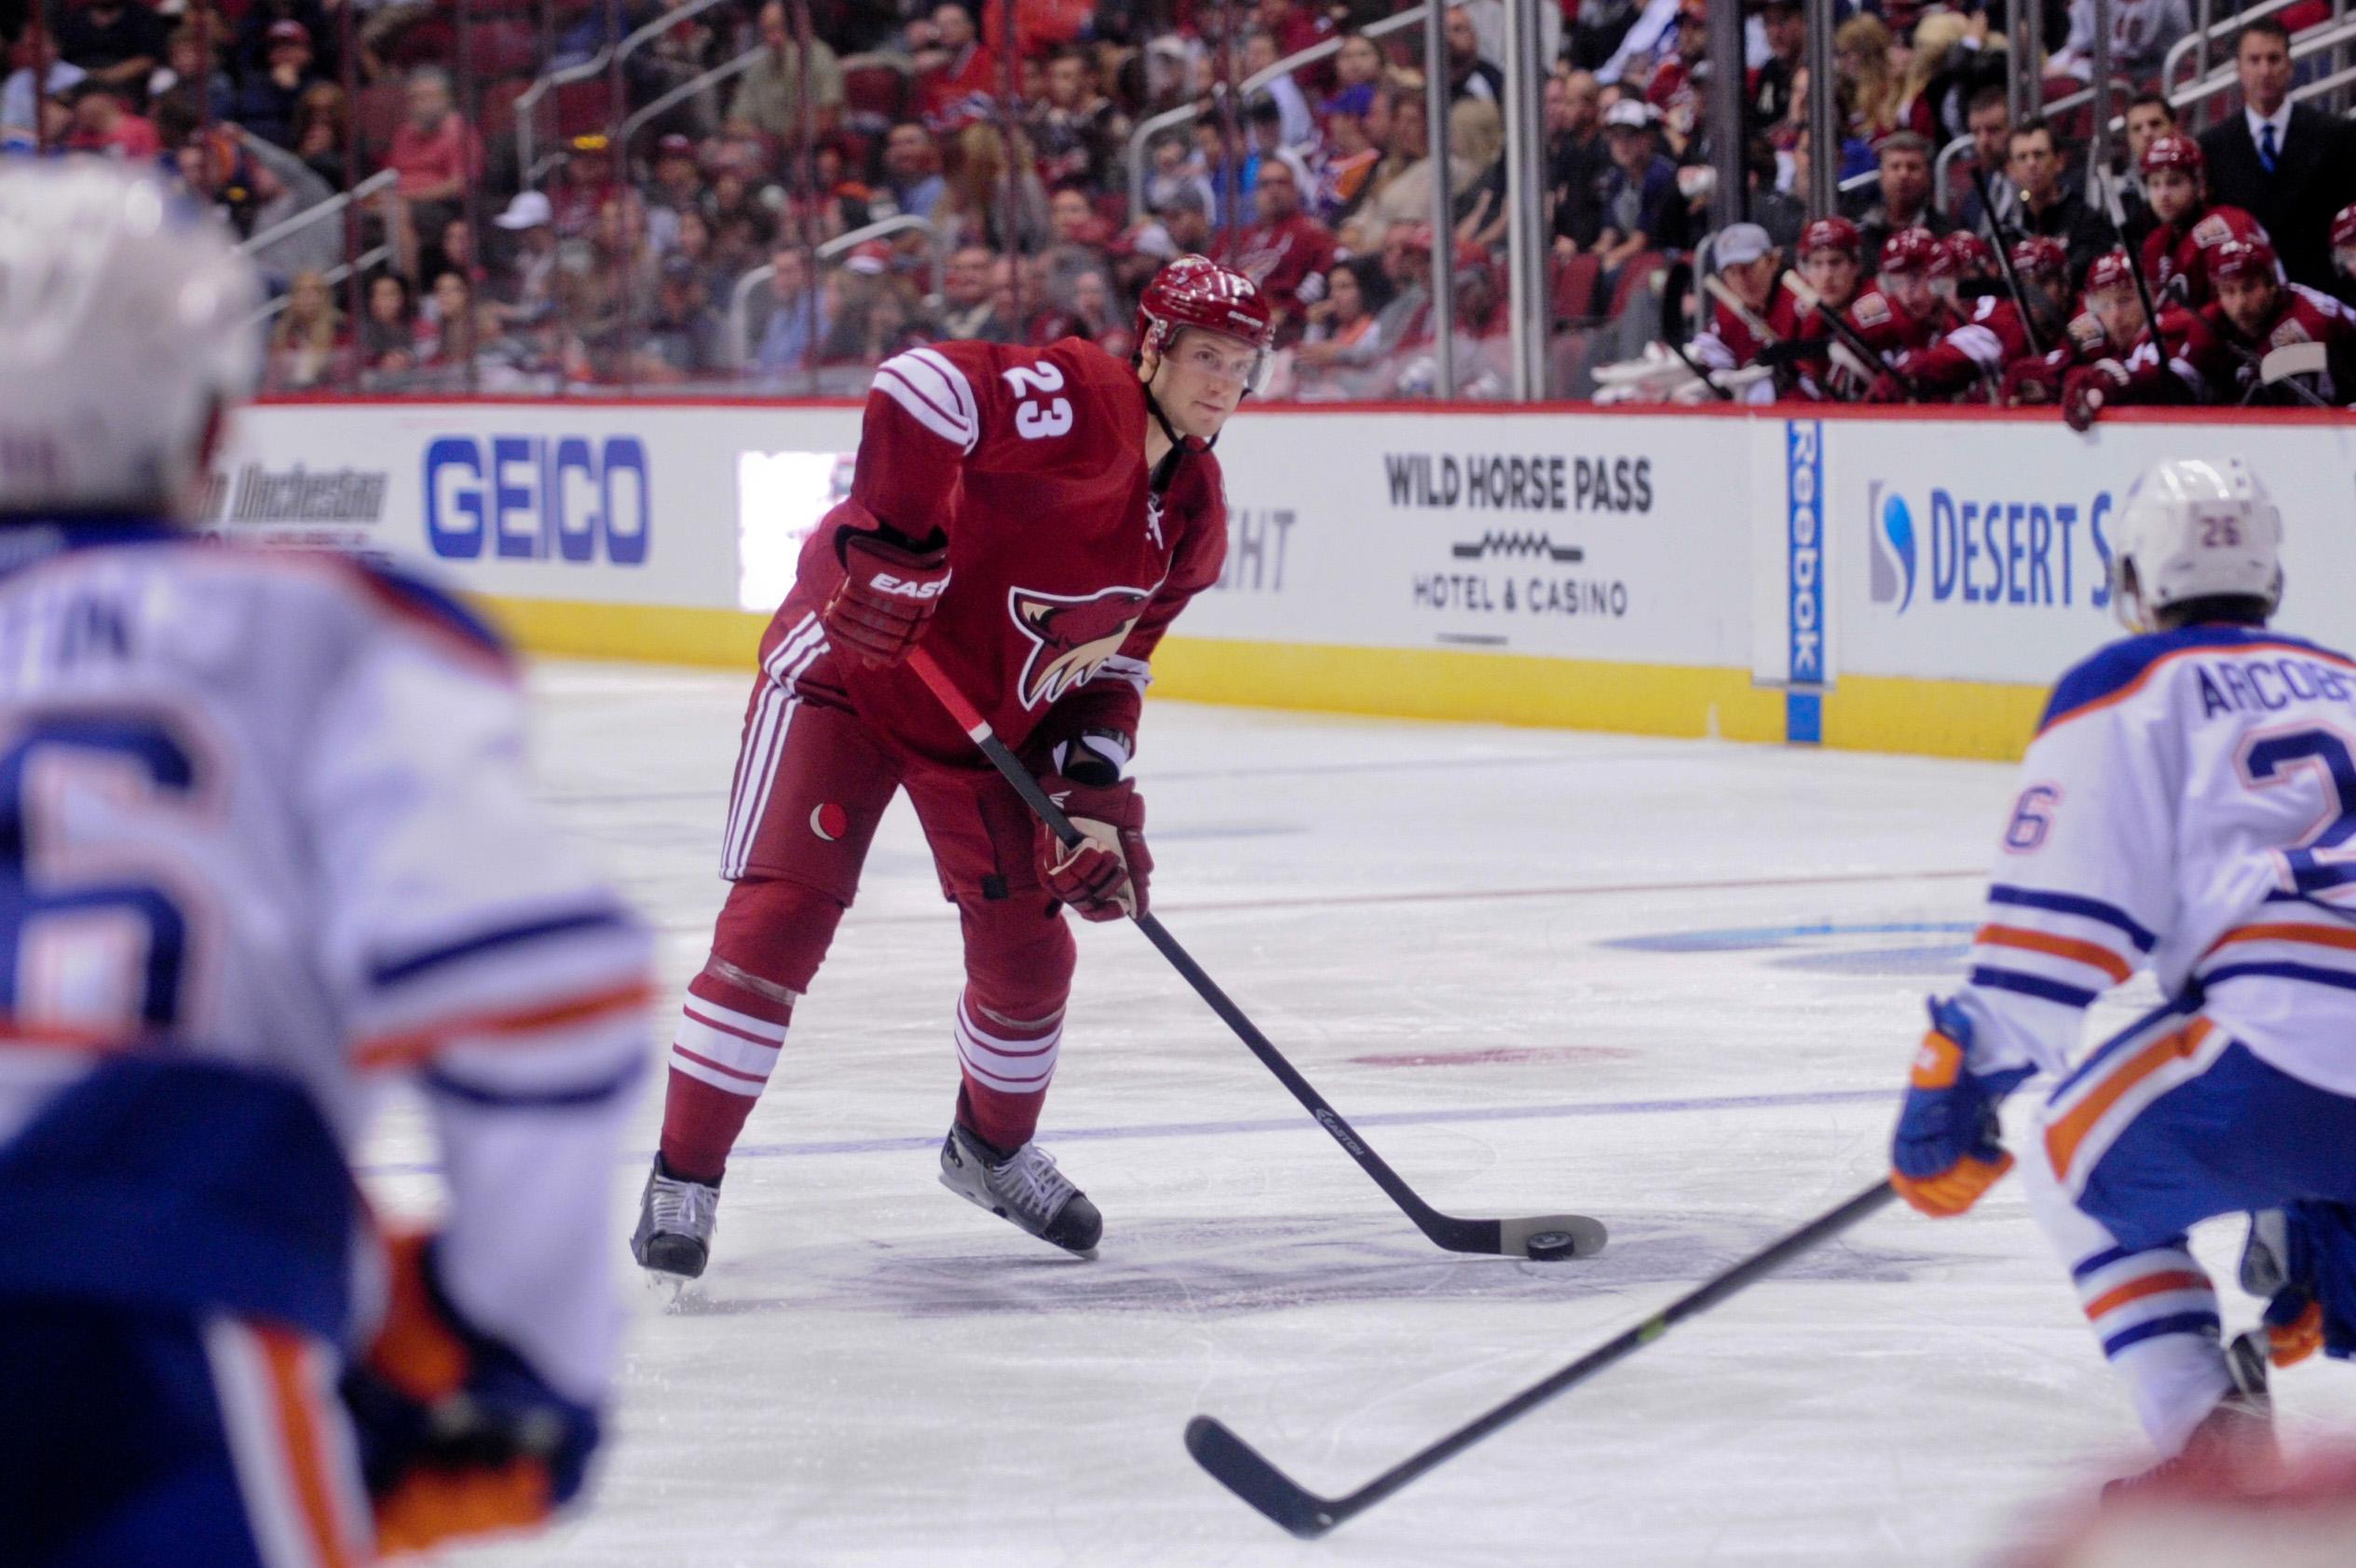 Oct 15, 2014; Glendale, AZ, USA; Arizona Coyotes defenseman Oliver Ekman-Larsson (23) shoots the puck as Edmonton Oilers defenseman Nikita Nikitin (86) and center Mark Arcobello (26) defend during the third period at Gila River Arena. (Matt Kartozian-USA TODAY Sports)